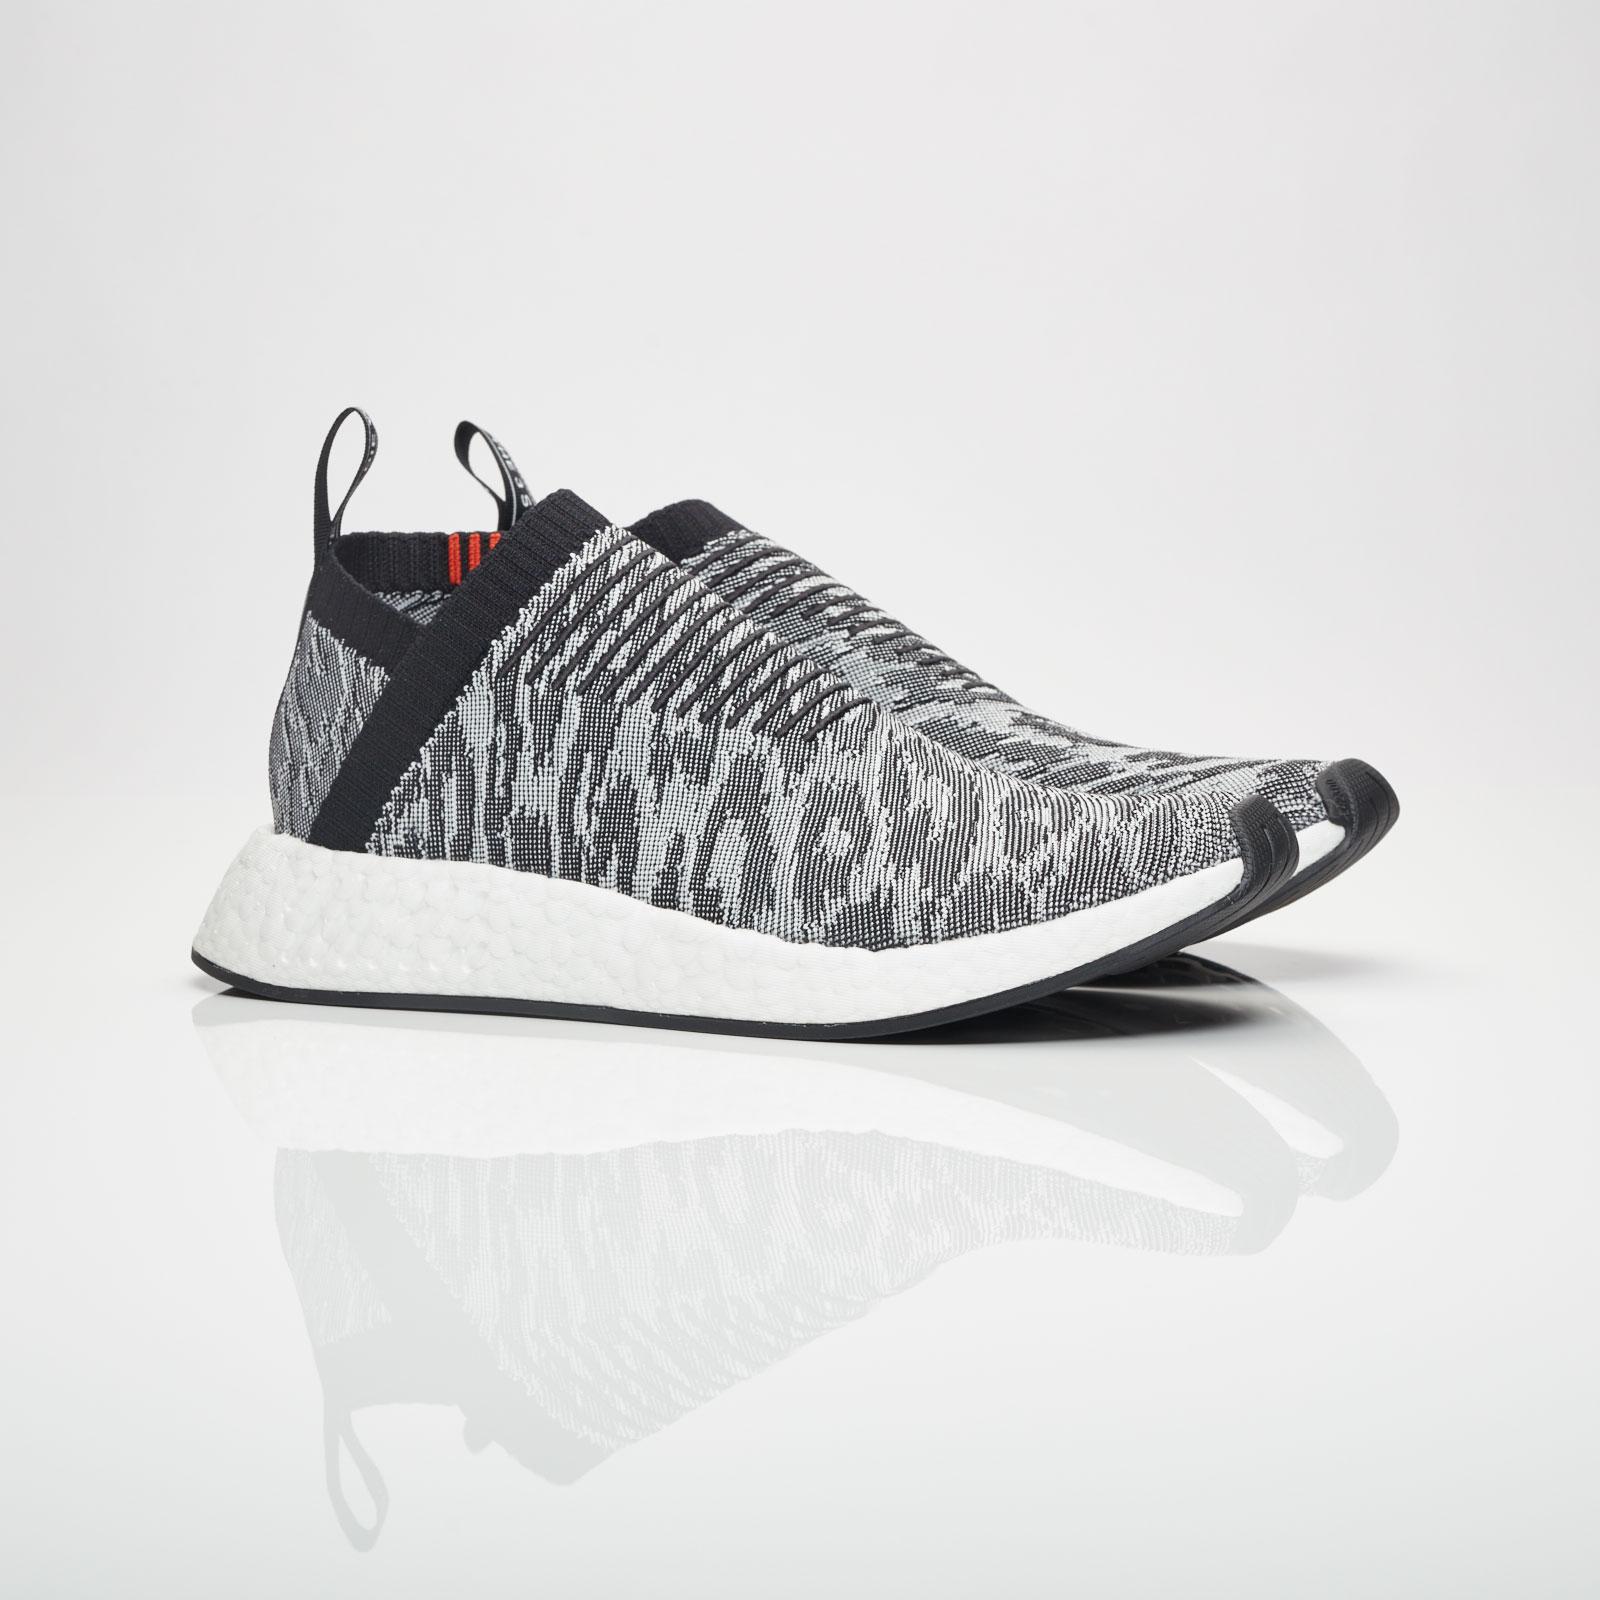 Adidas NMD CS2 PK bz0515 sneakersnstuff zapatilla & Streetwear